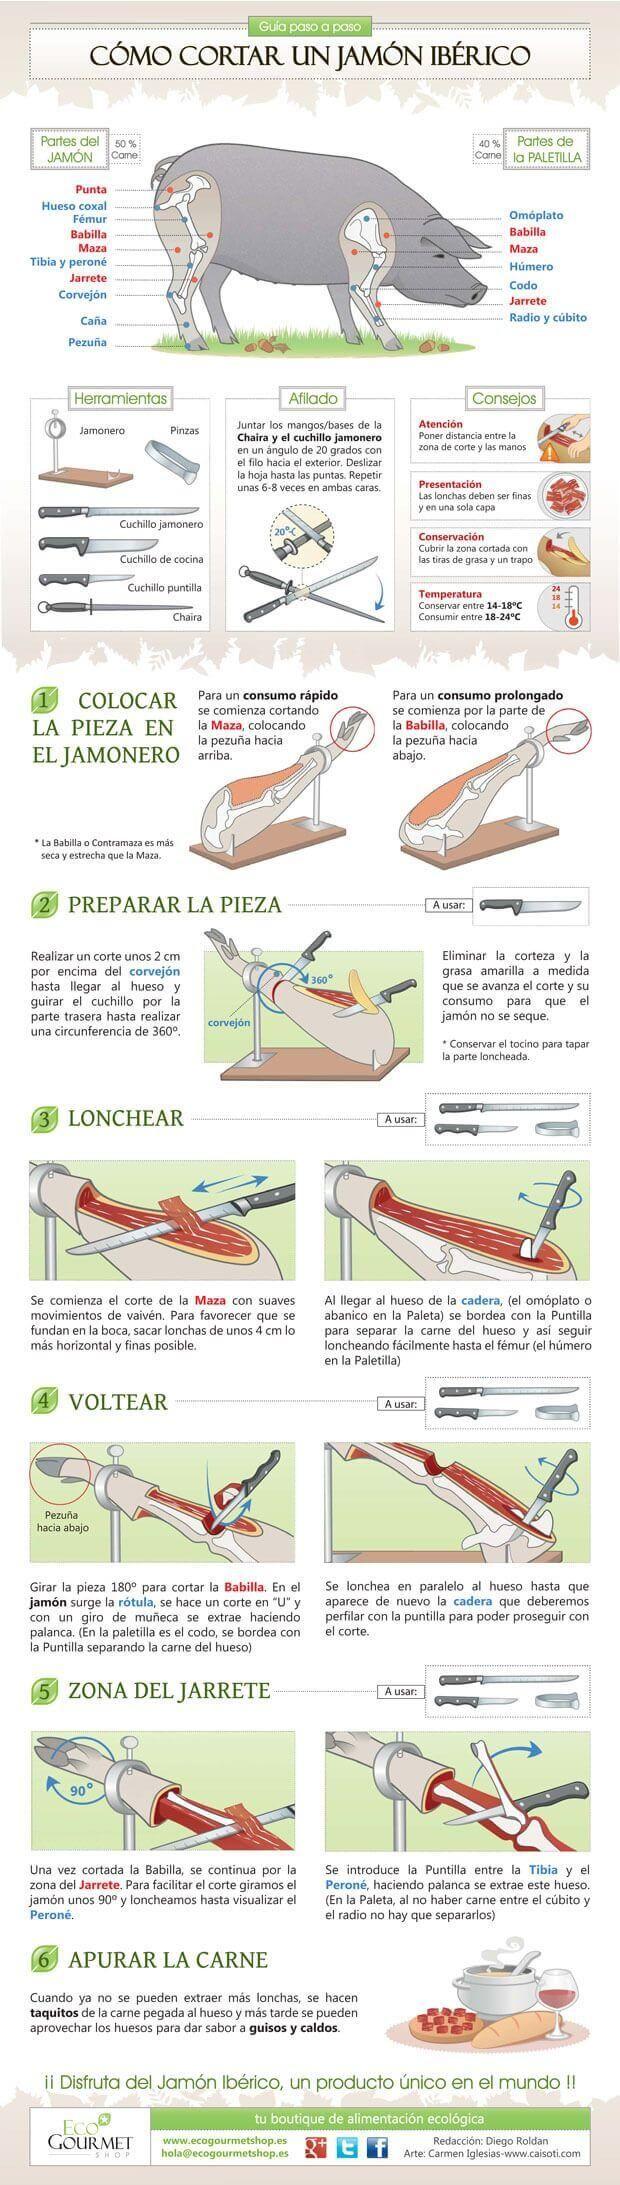 Infografía Cómo cortar un jamón ibérico paso a paso